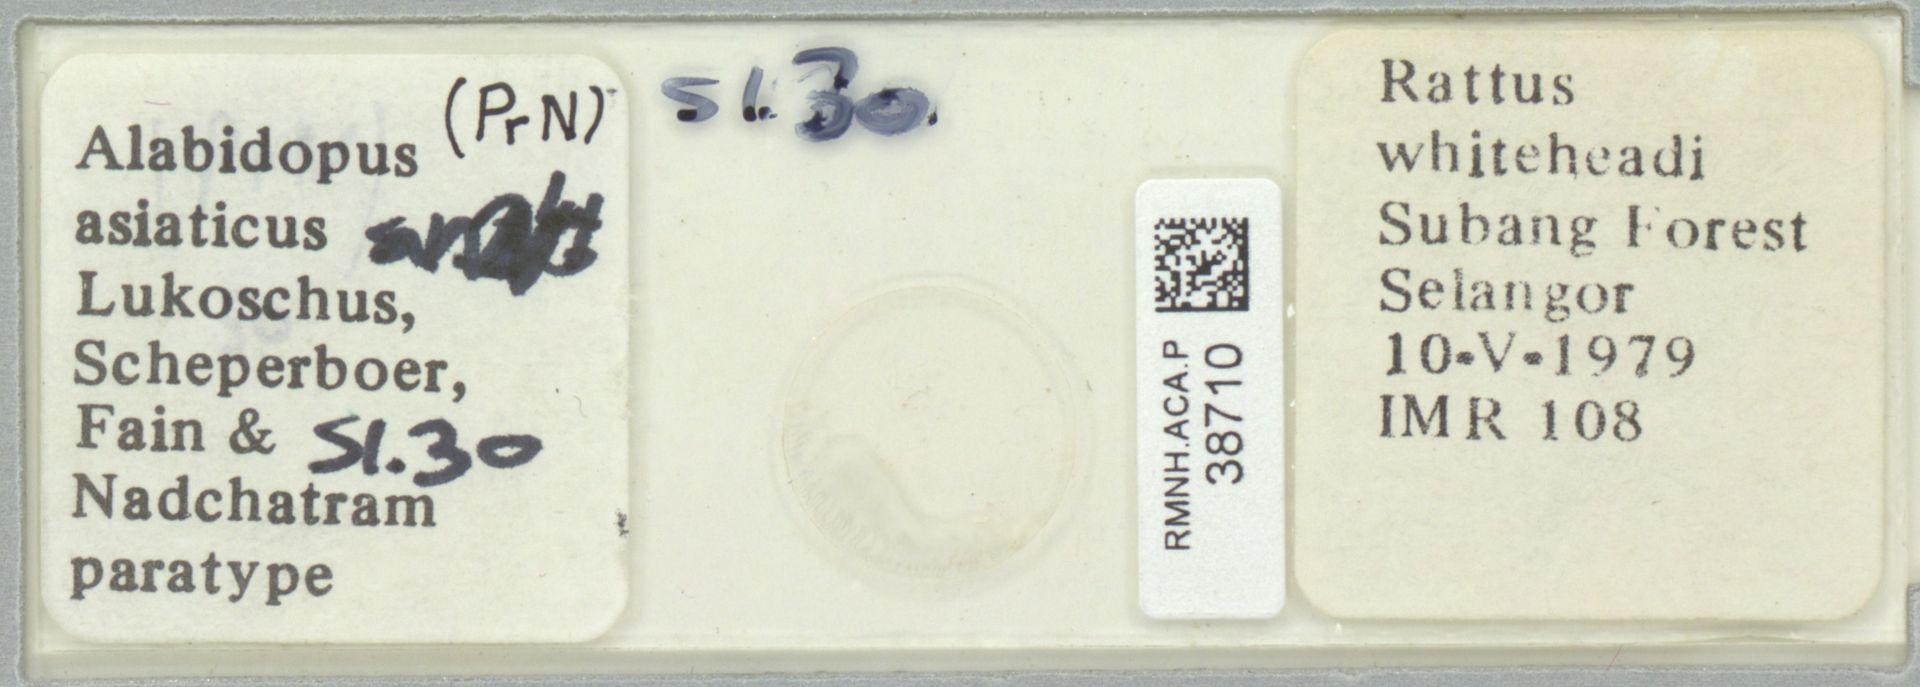 RMNH.ACA.P.38710 | Alabidopus asiaticus Lukoschus, Scheperboer, Fain & Nadchatram